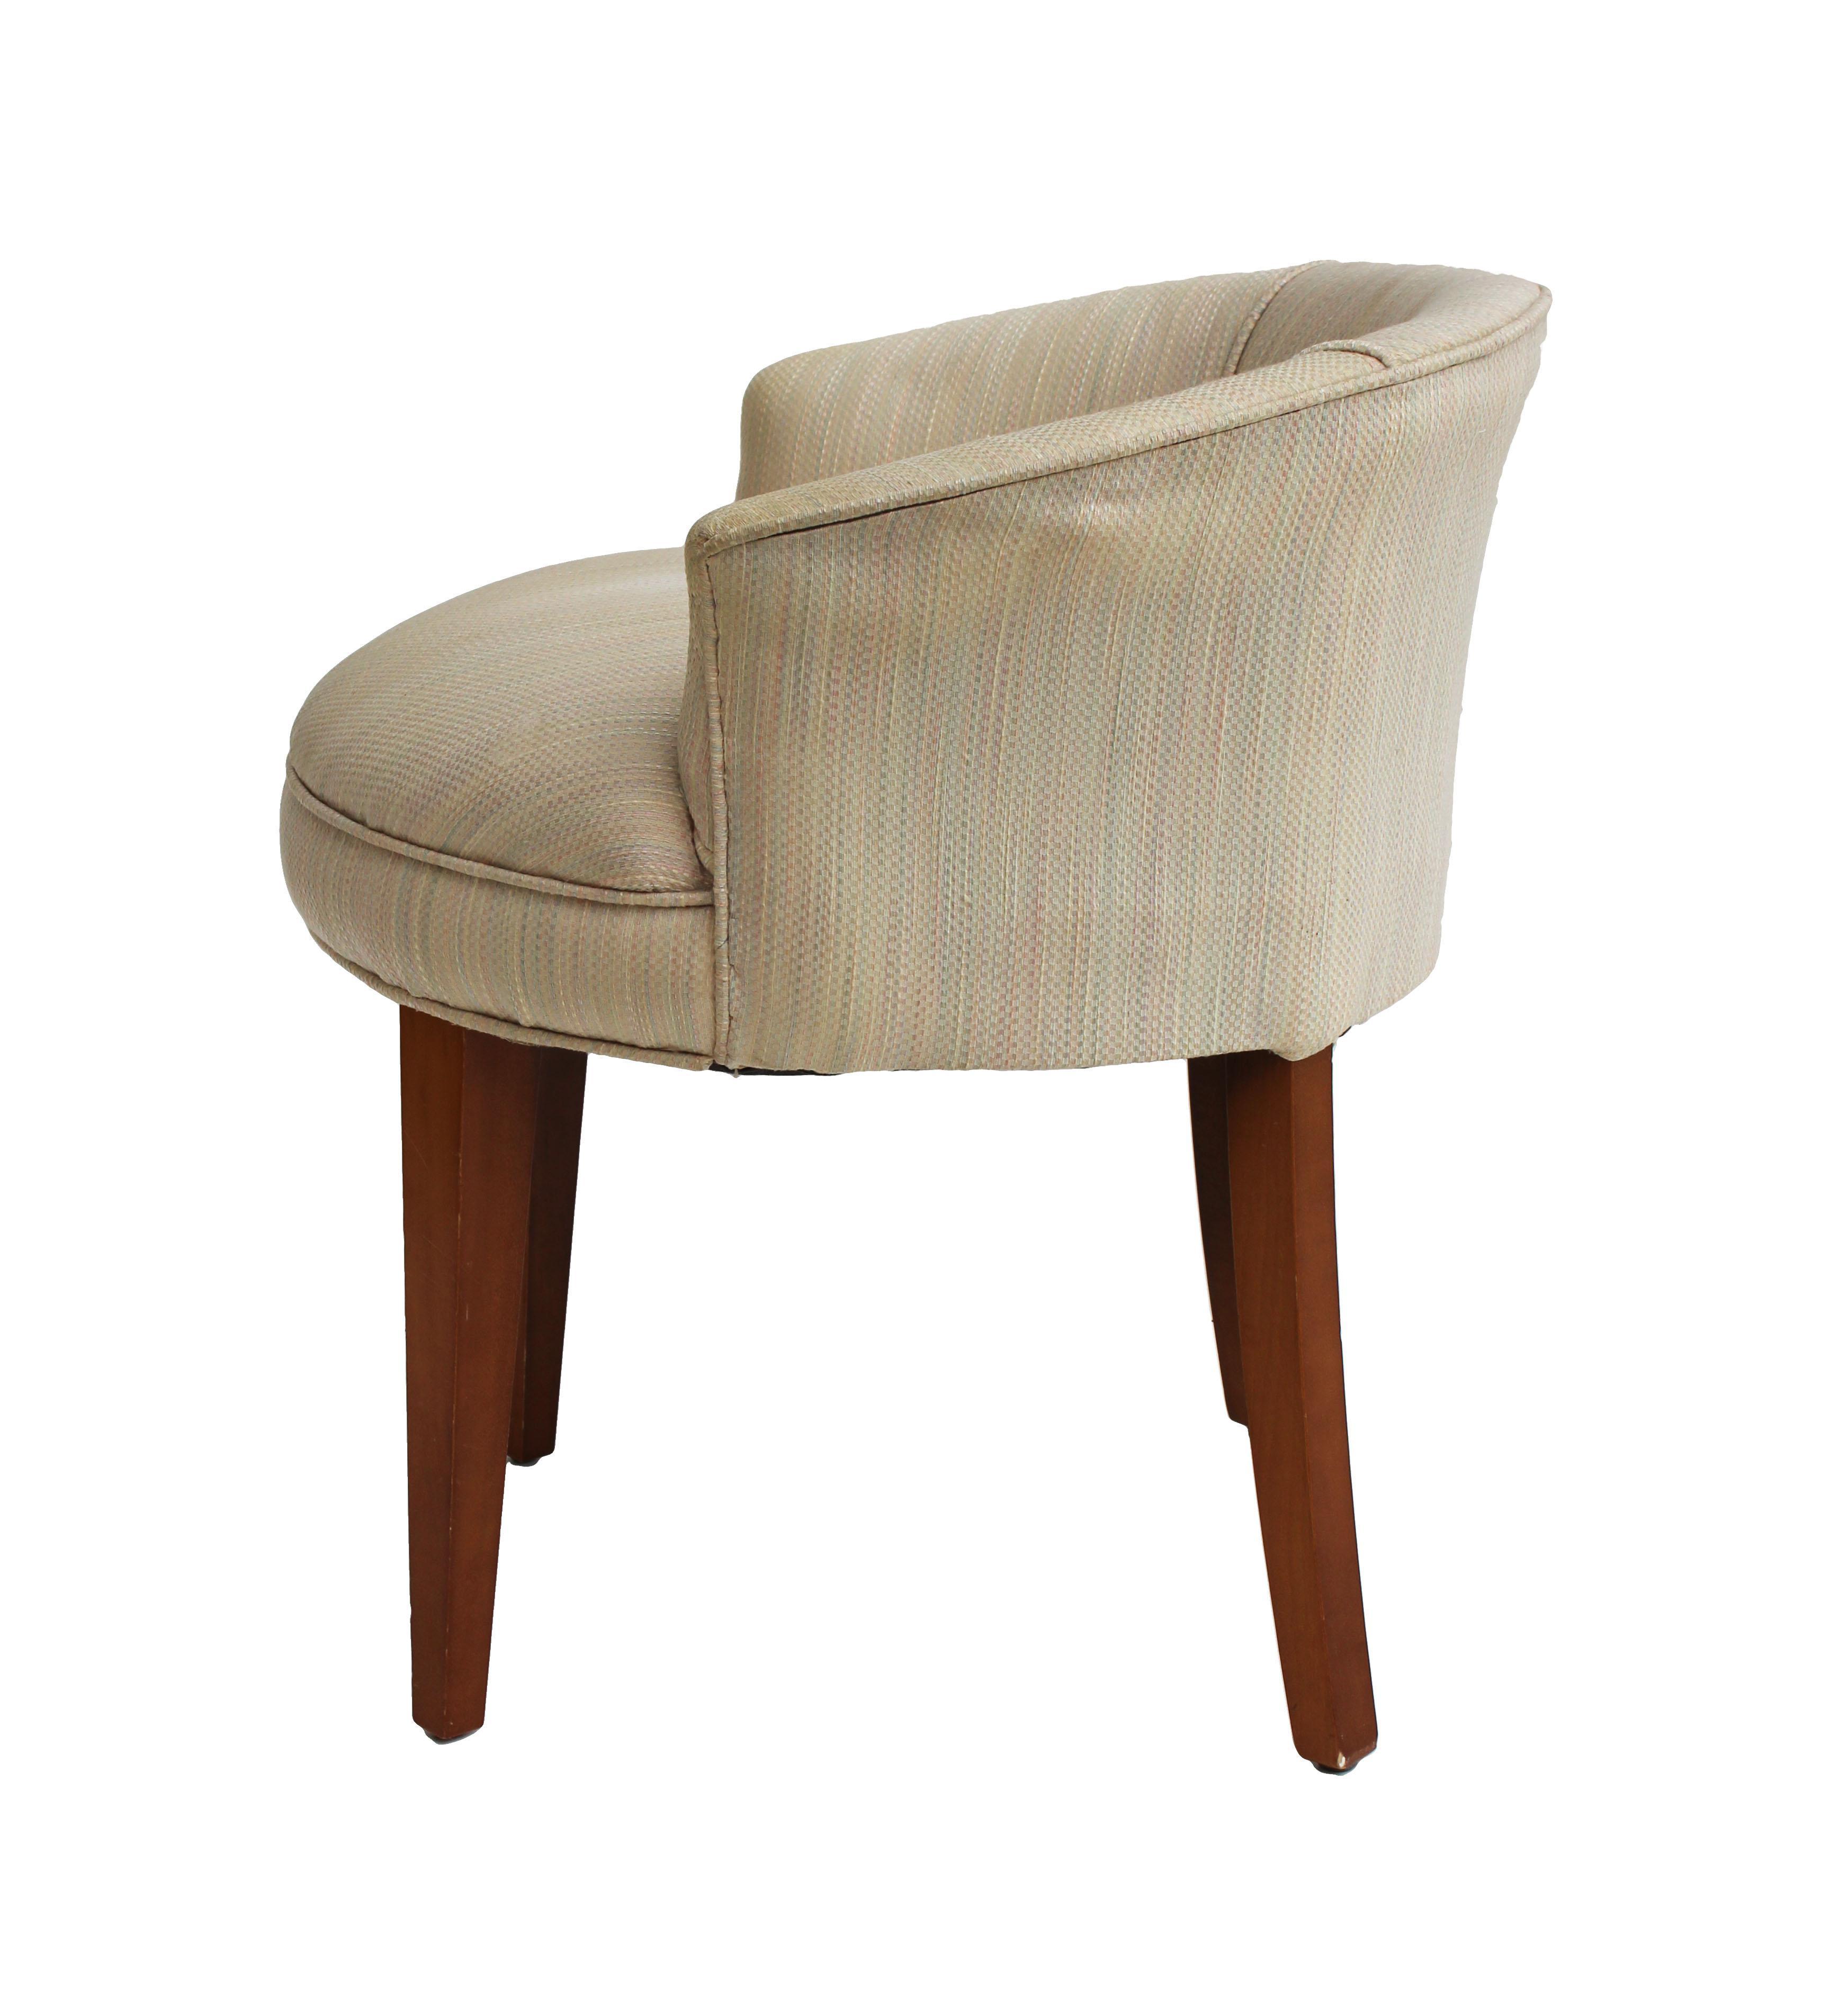 low vanity stool  Mid-Century Low-Backed Vanity Stool | Chairish